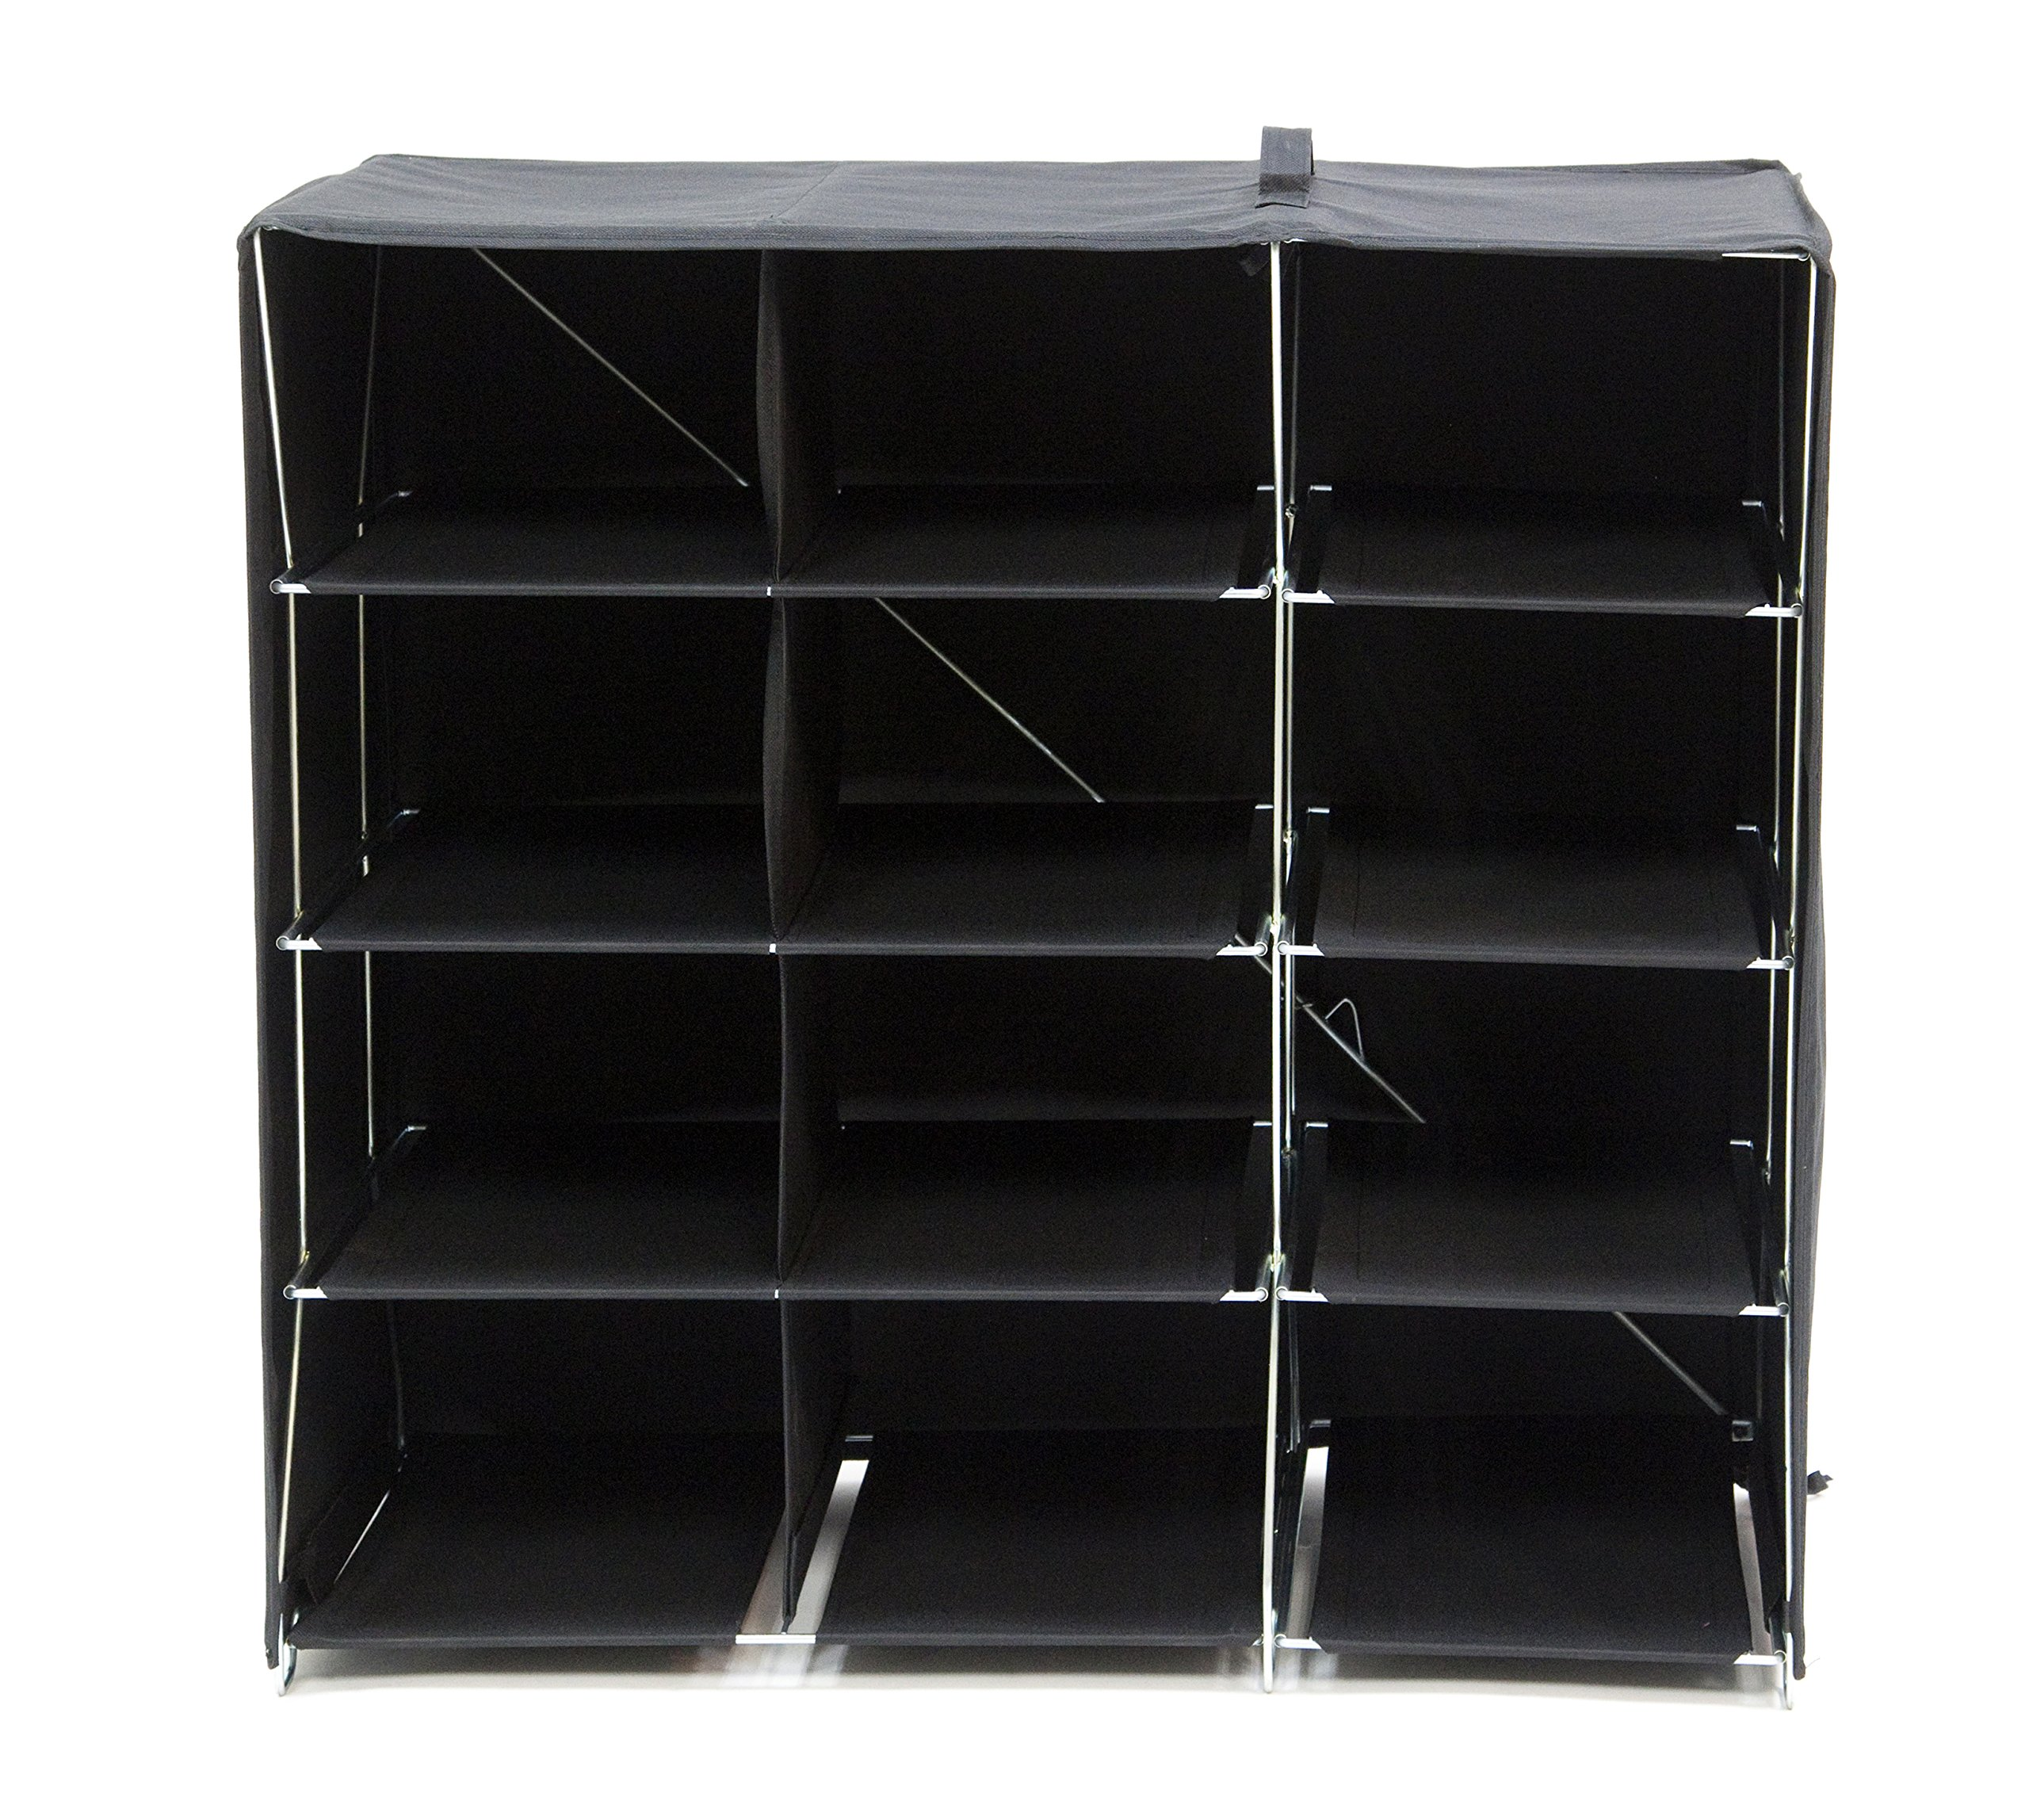 Origami R-FSR-12-B 12-Shelf Foldable Shoe Rack, Fabric Backing, Black